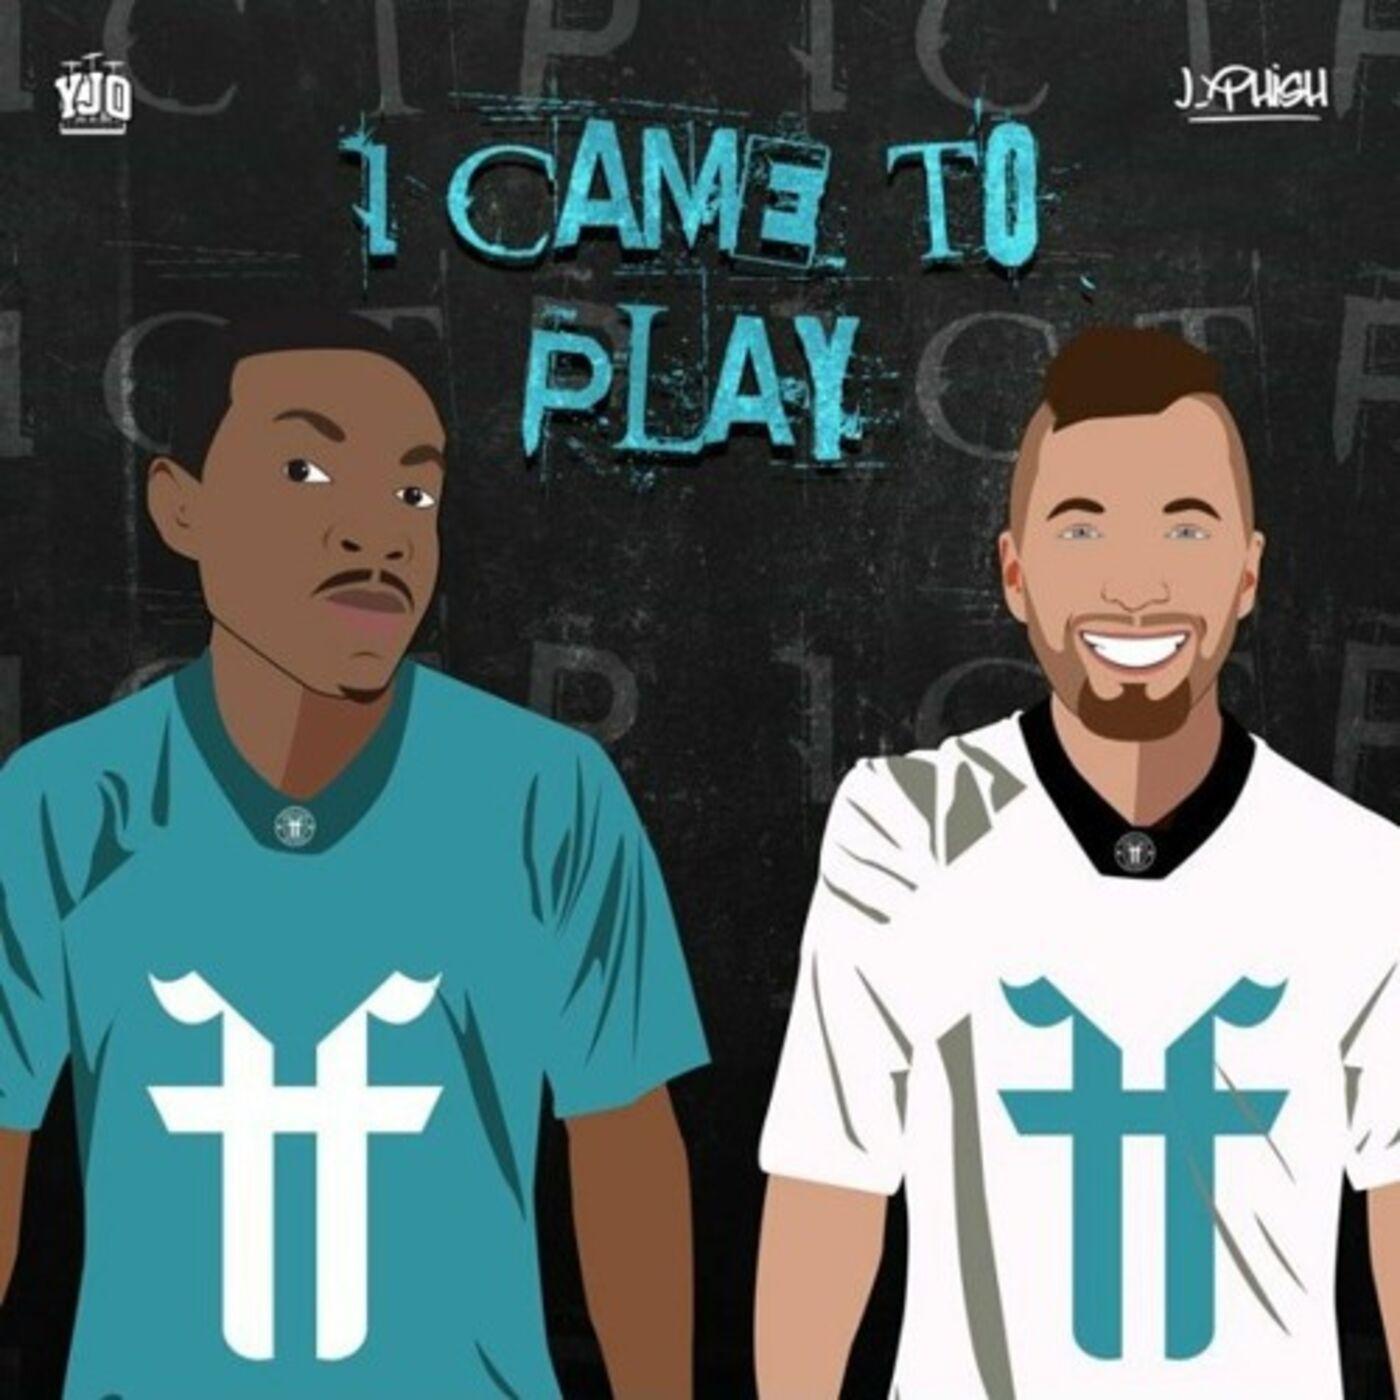 I Came To Play - J-Phish (ft). YJO